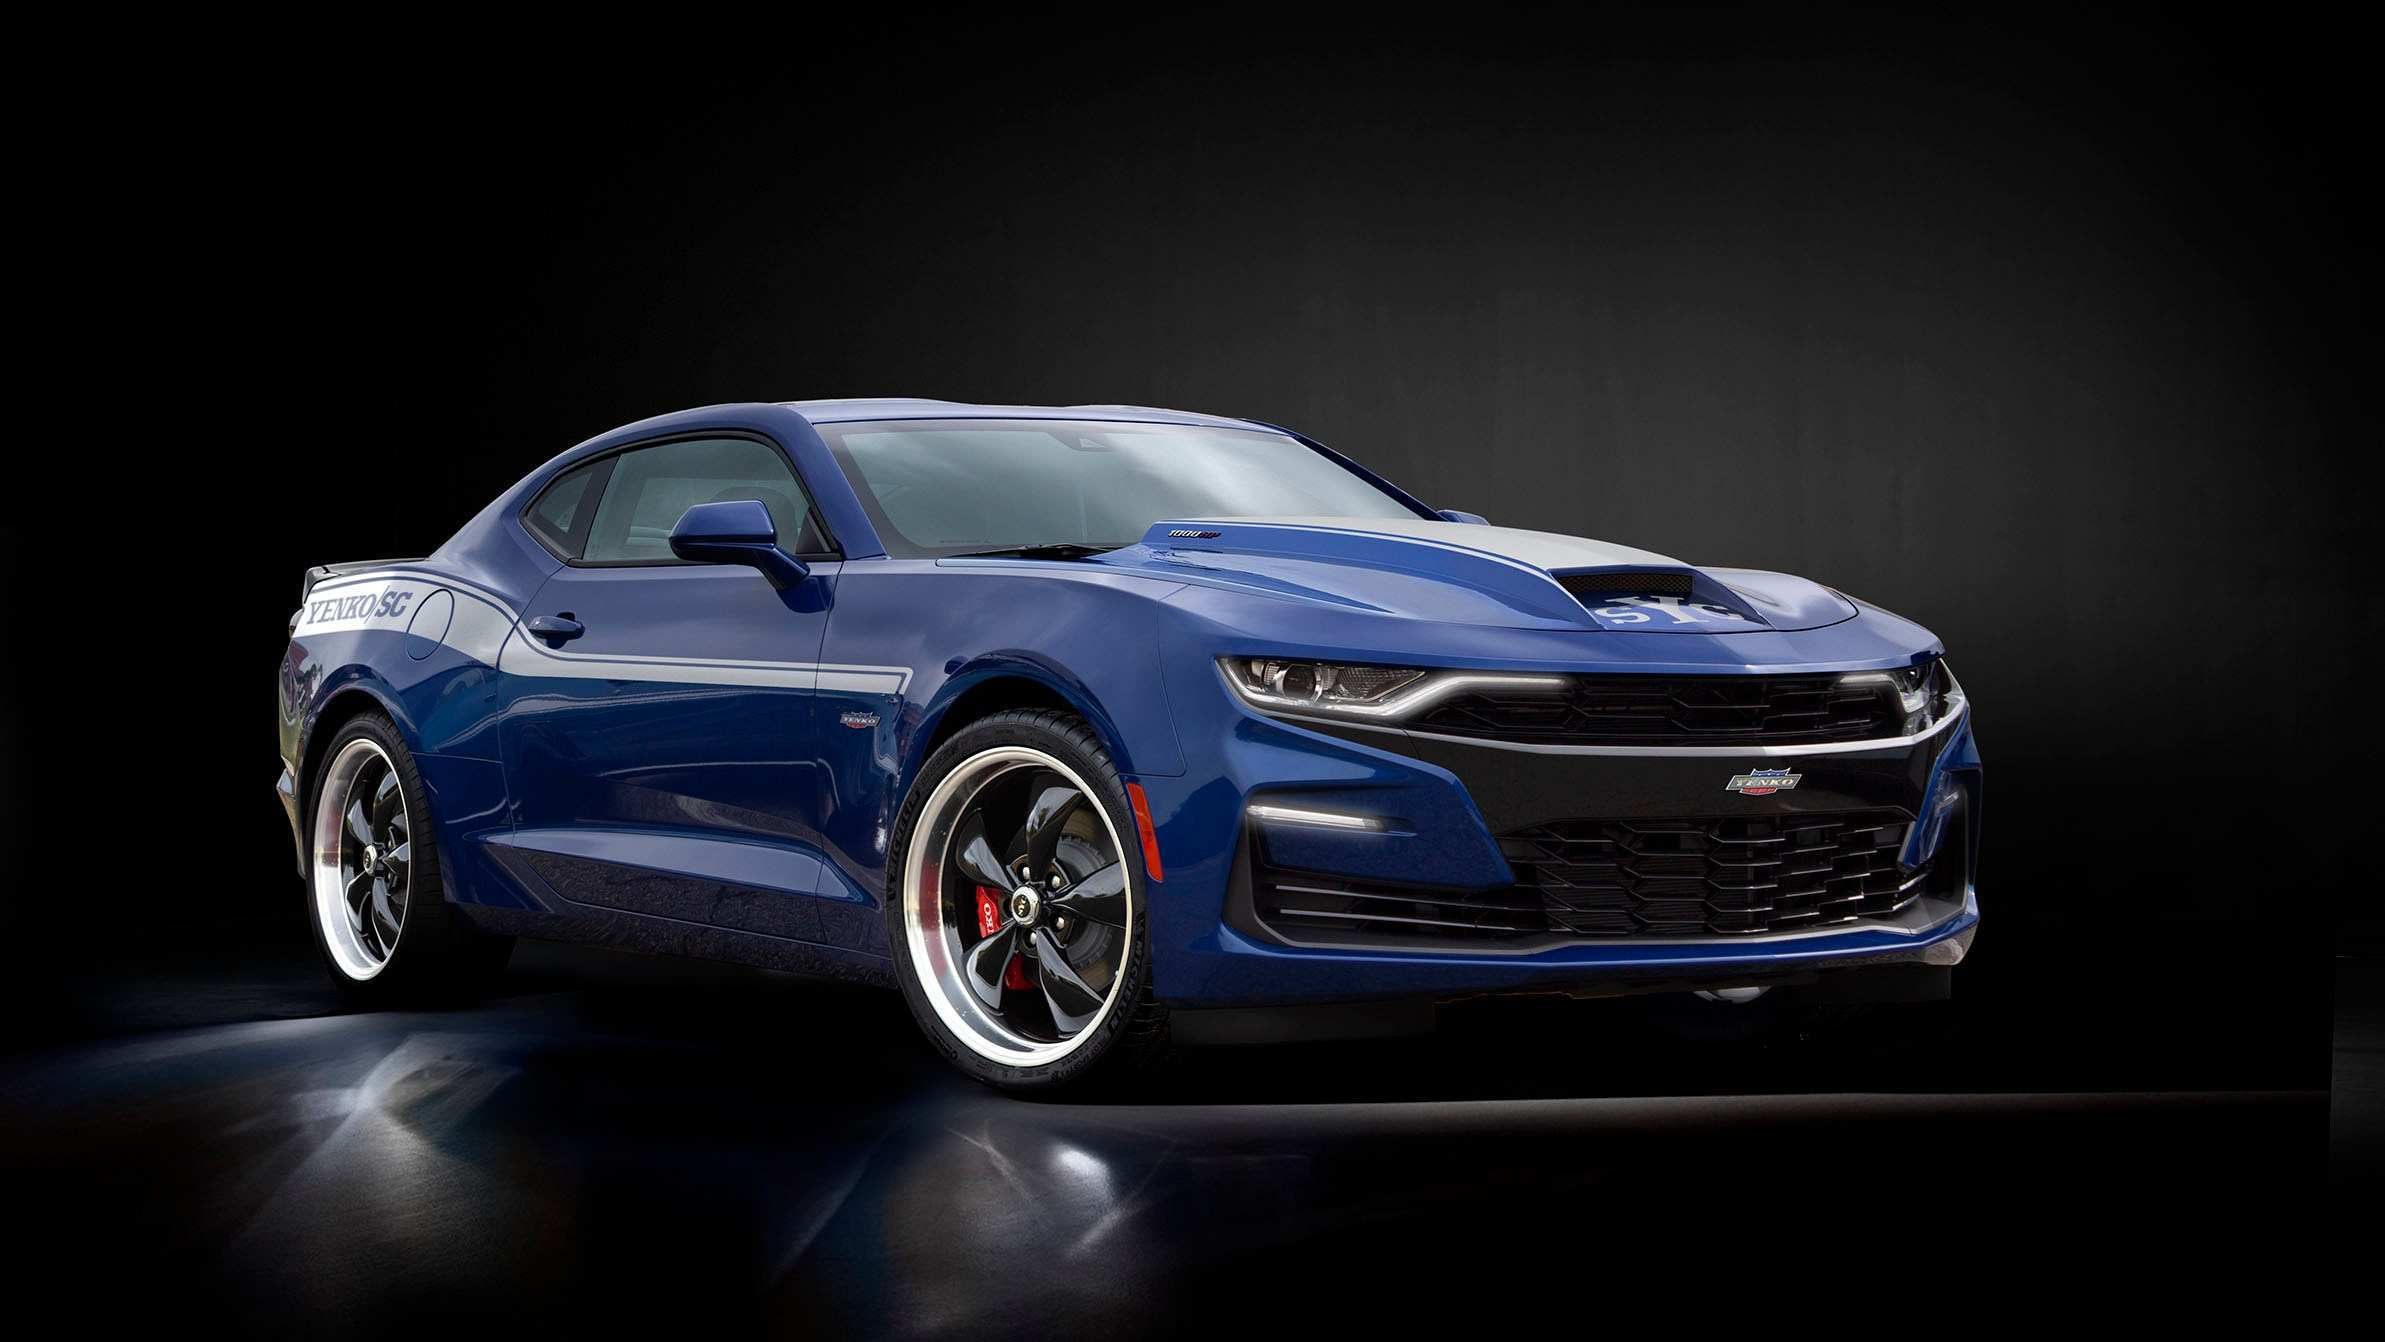 18 Gallery of 2019 Chevrolet Camaro Engine Release with 2019 Chevrolet Camaro Engine